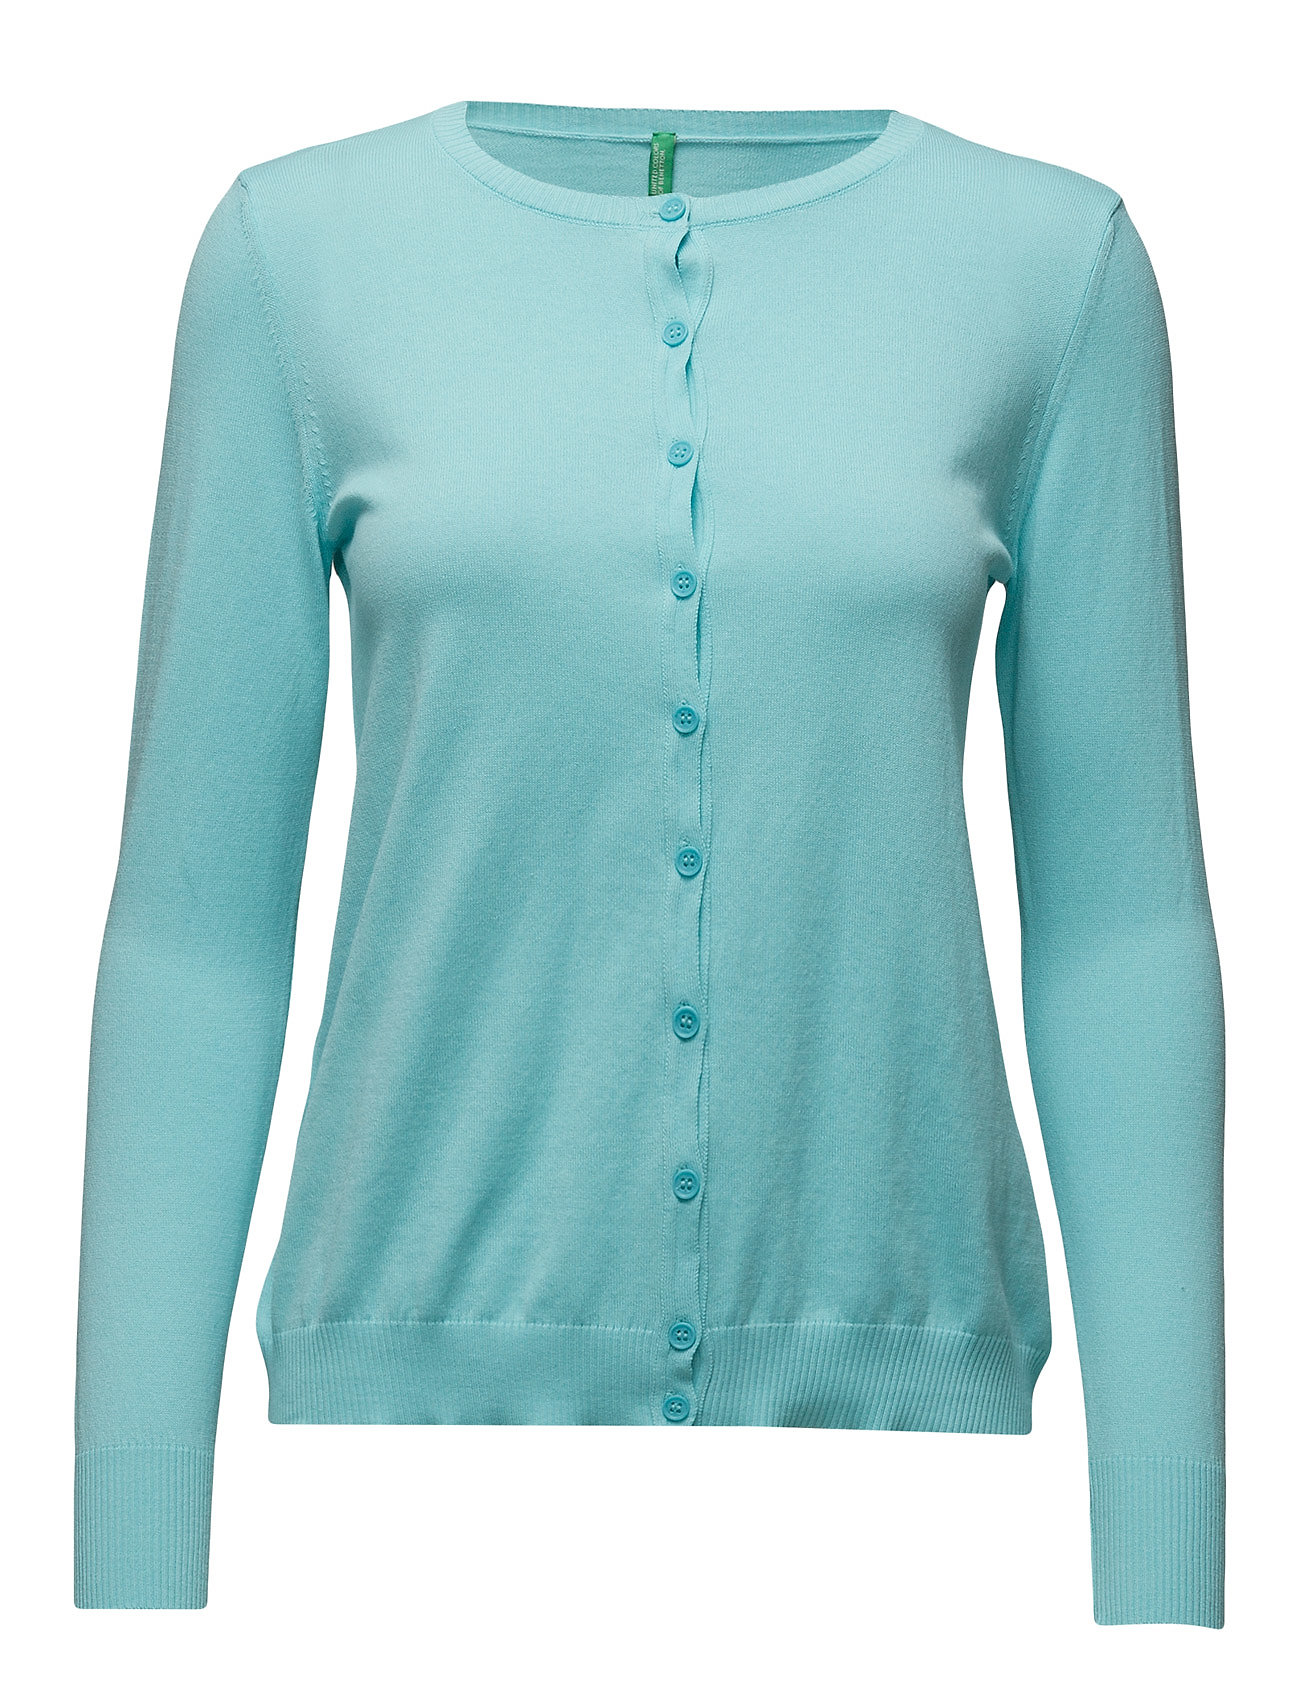 L/S Sweater United Colors of Benetton Cardigans til Damer i